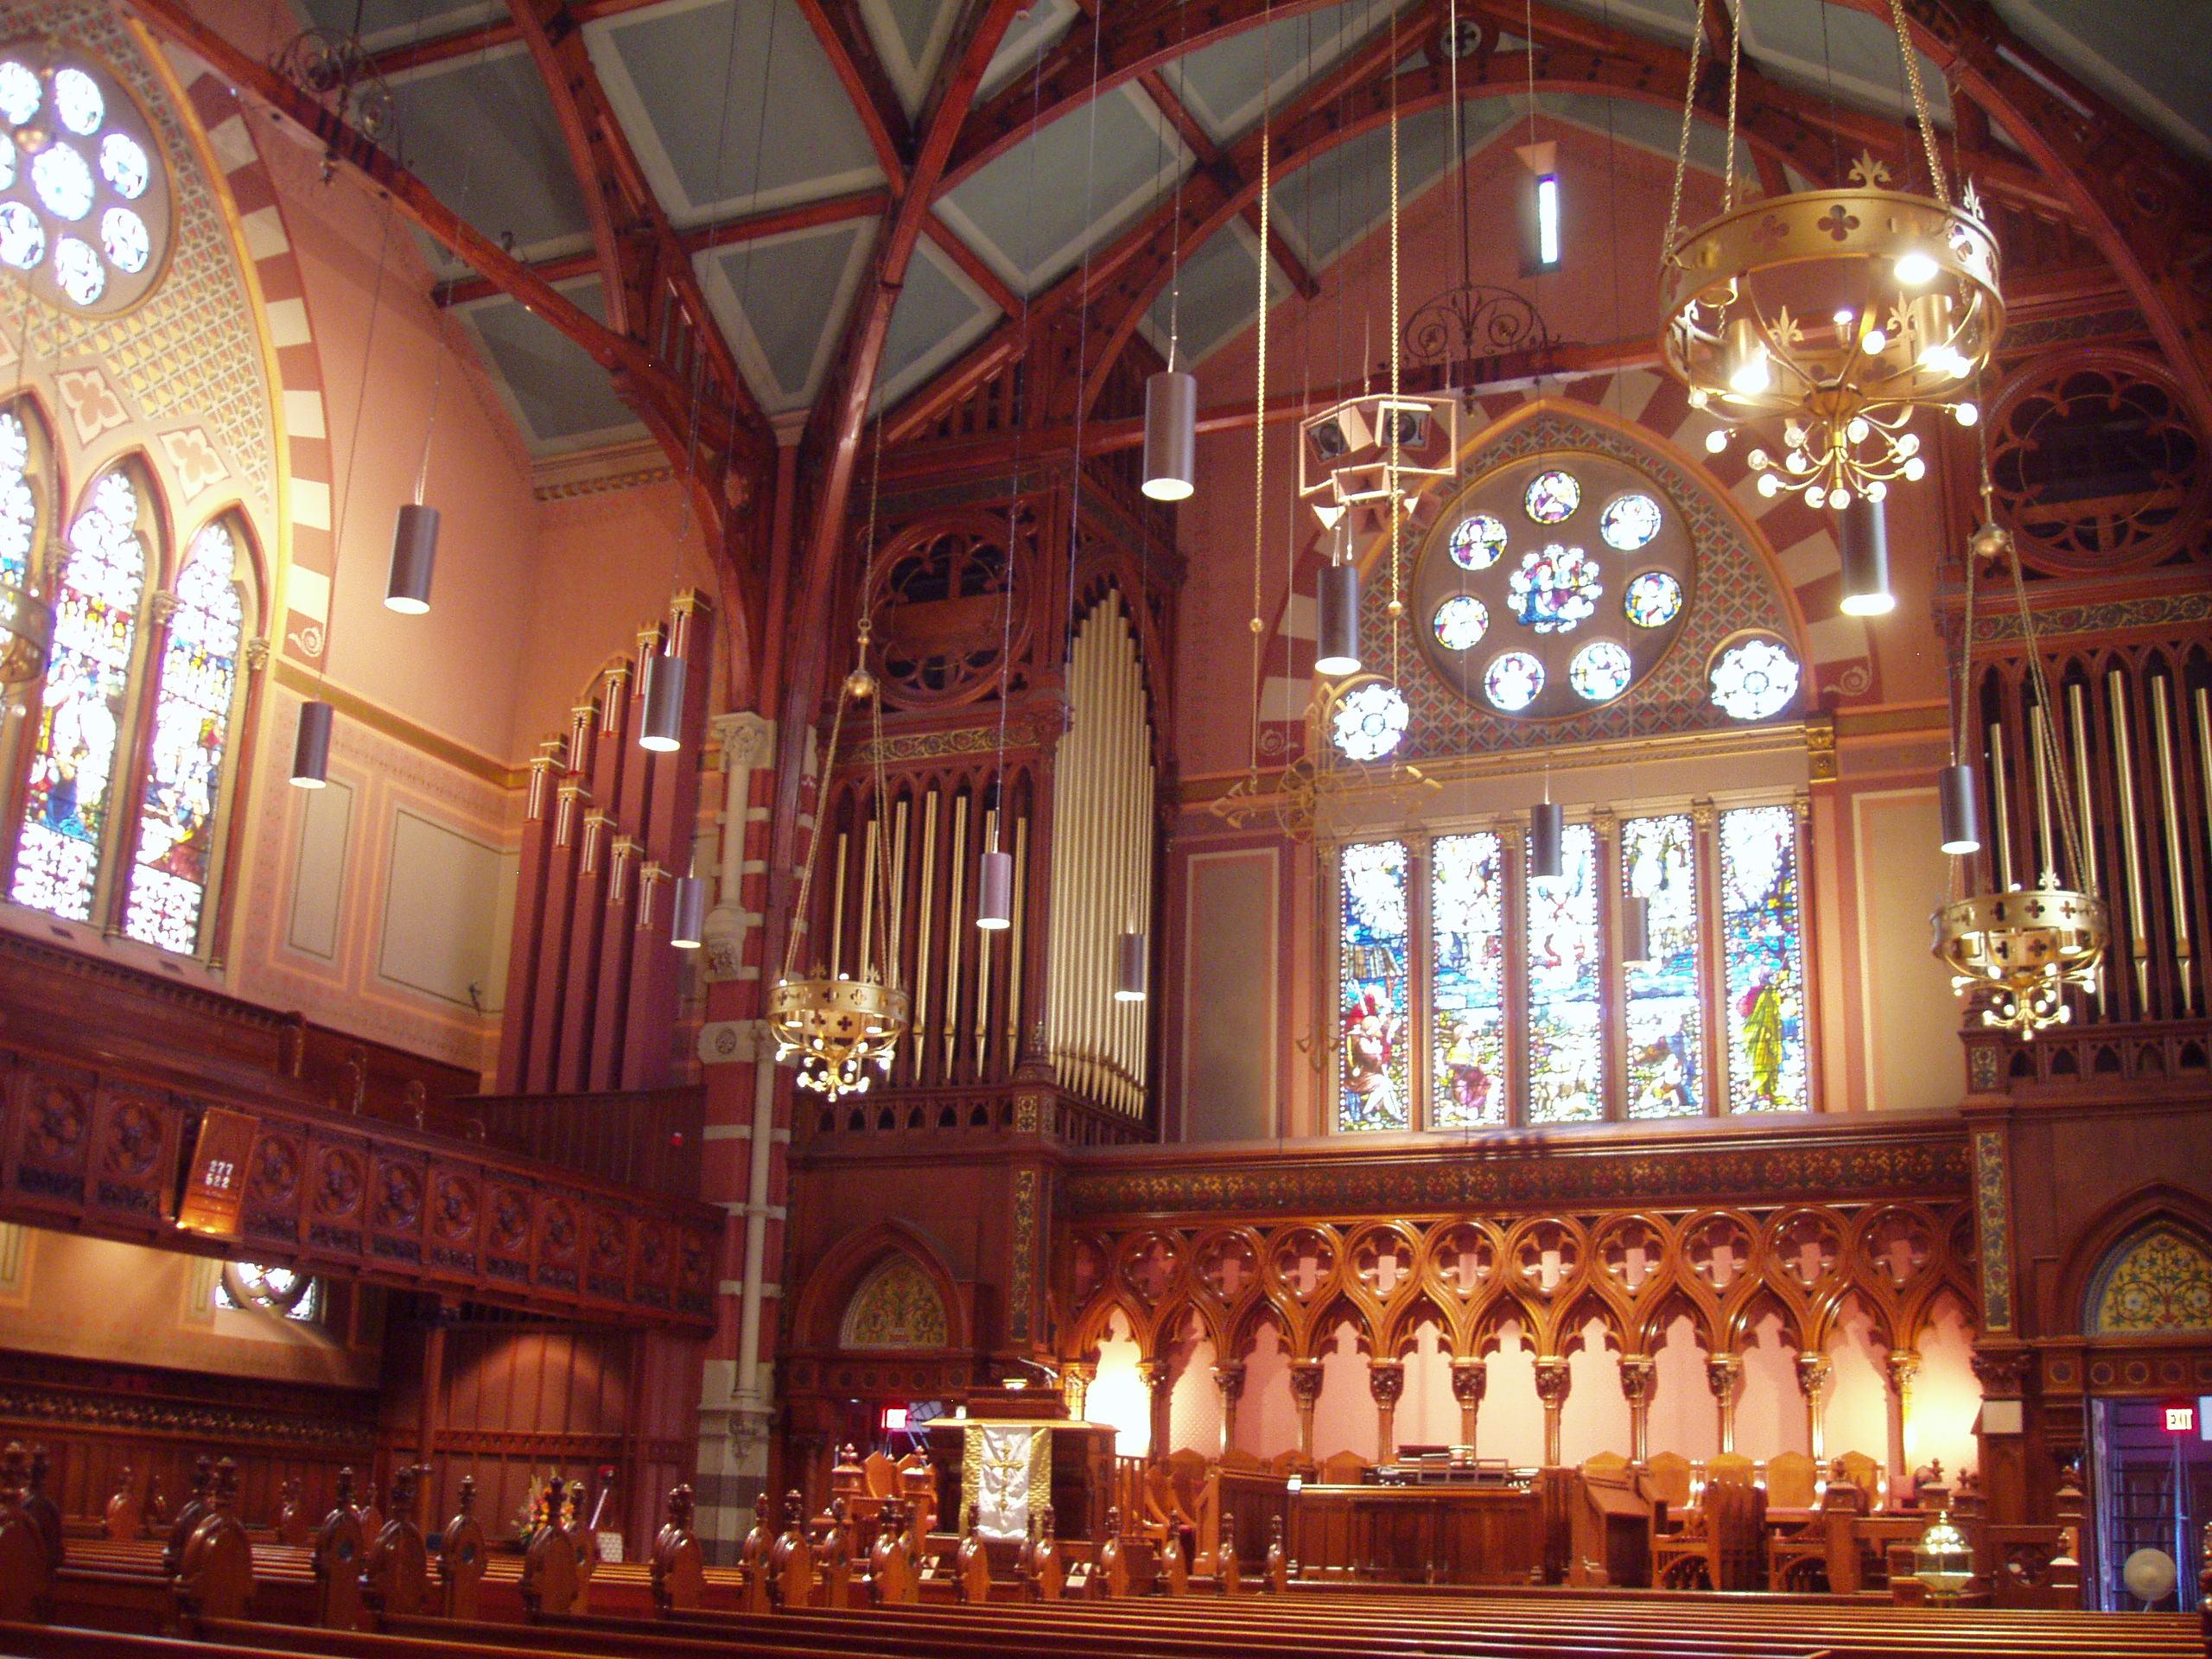 file old south church interior boston massachusetts jpg file old south church interior boston massachusetts jpg